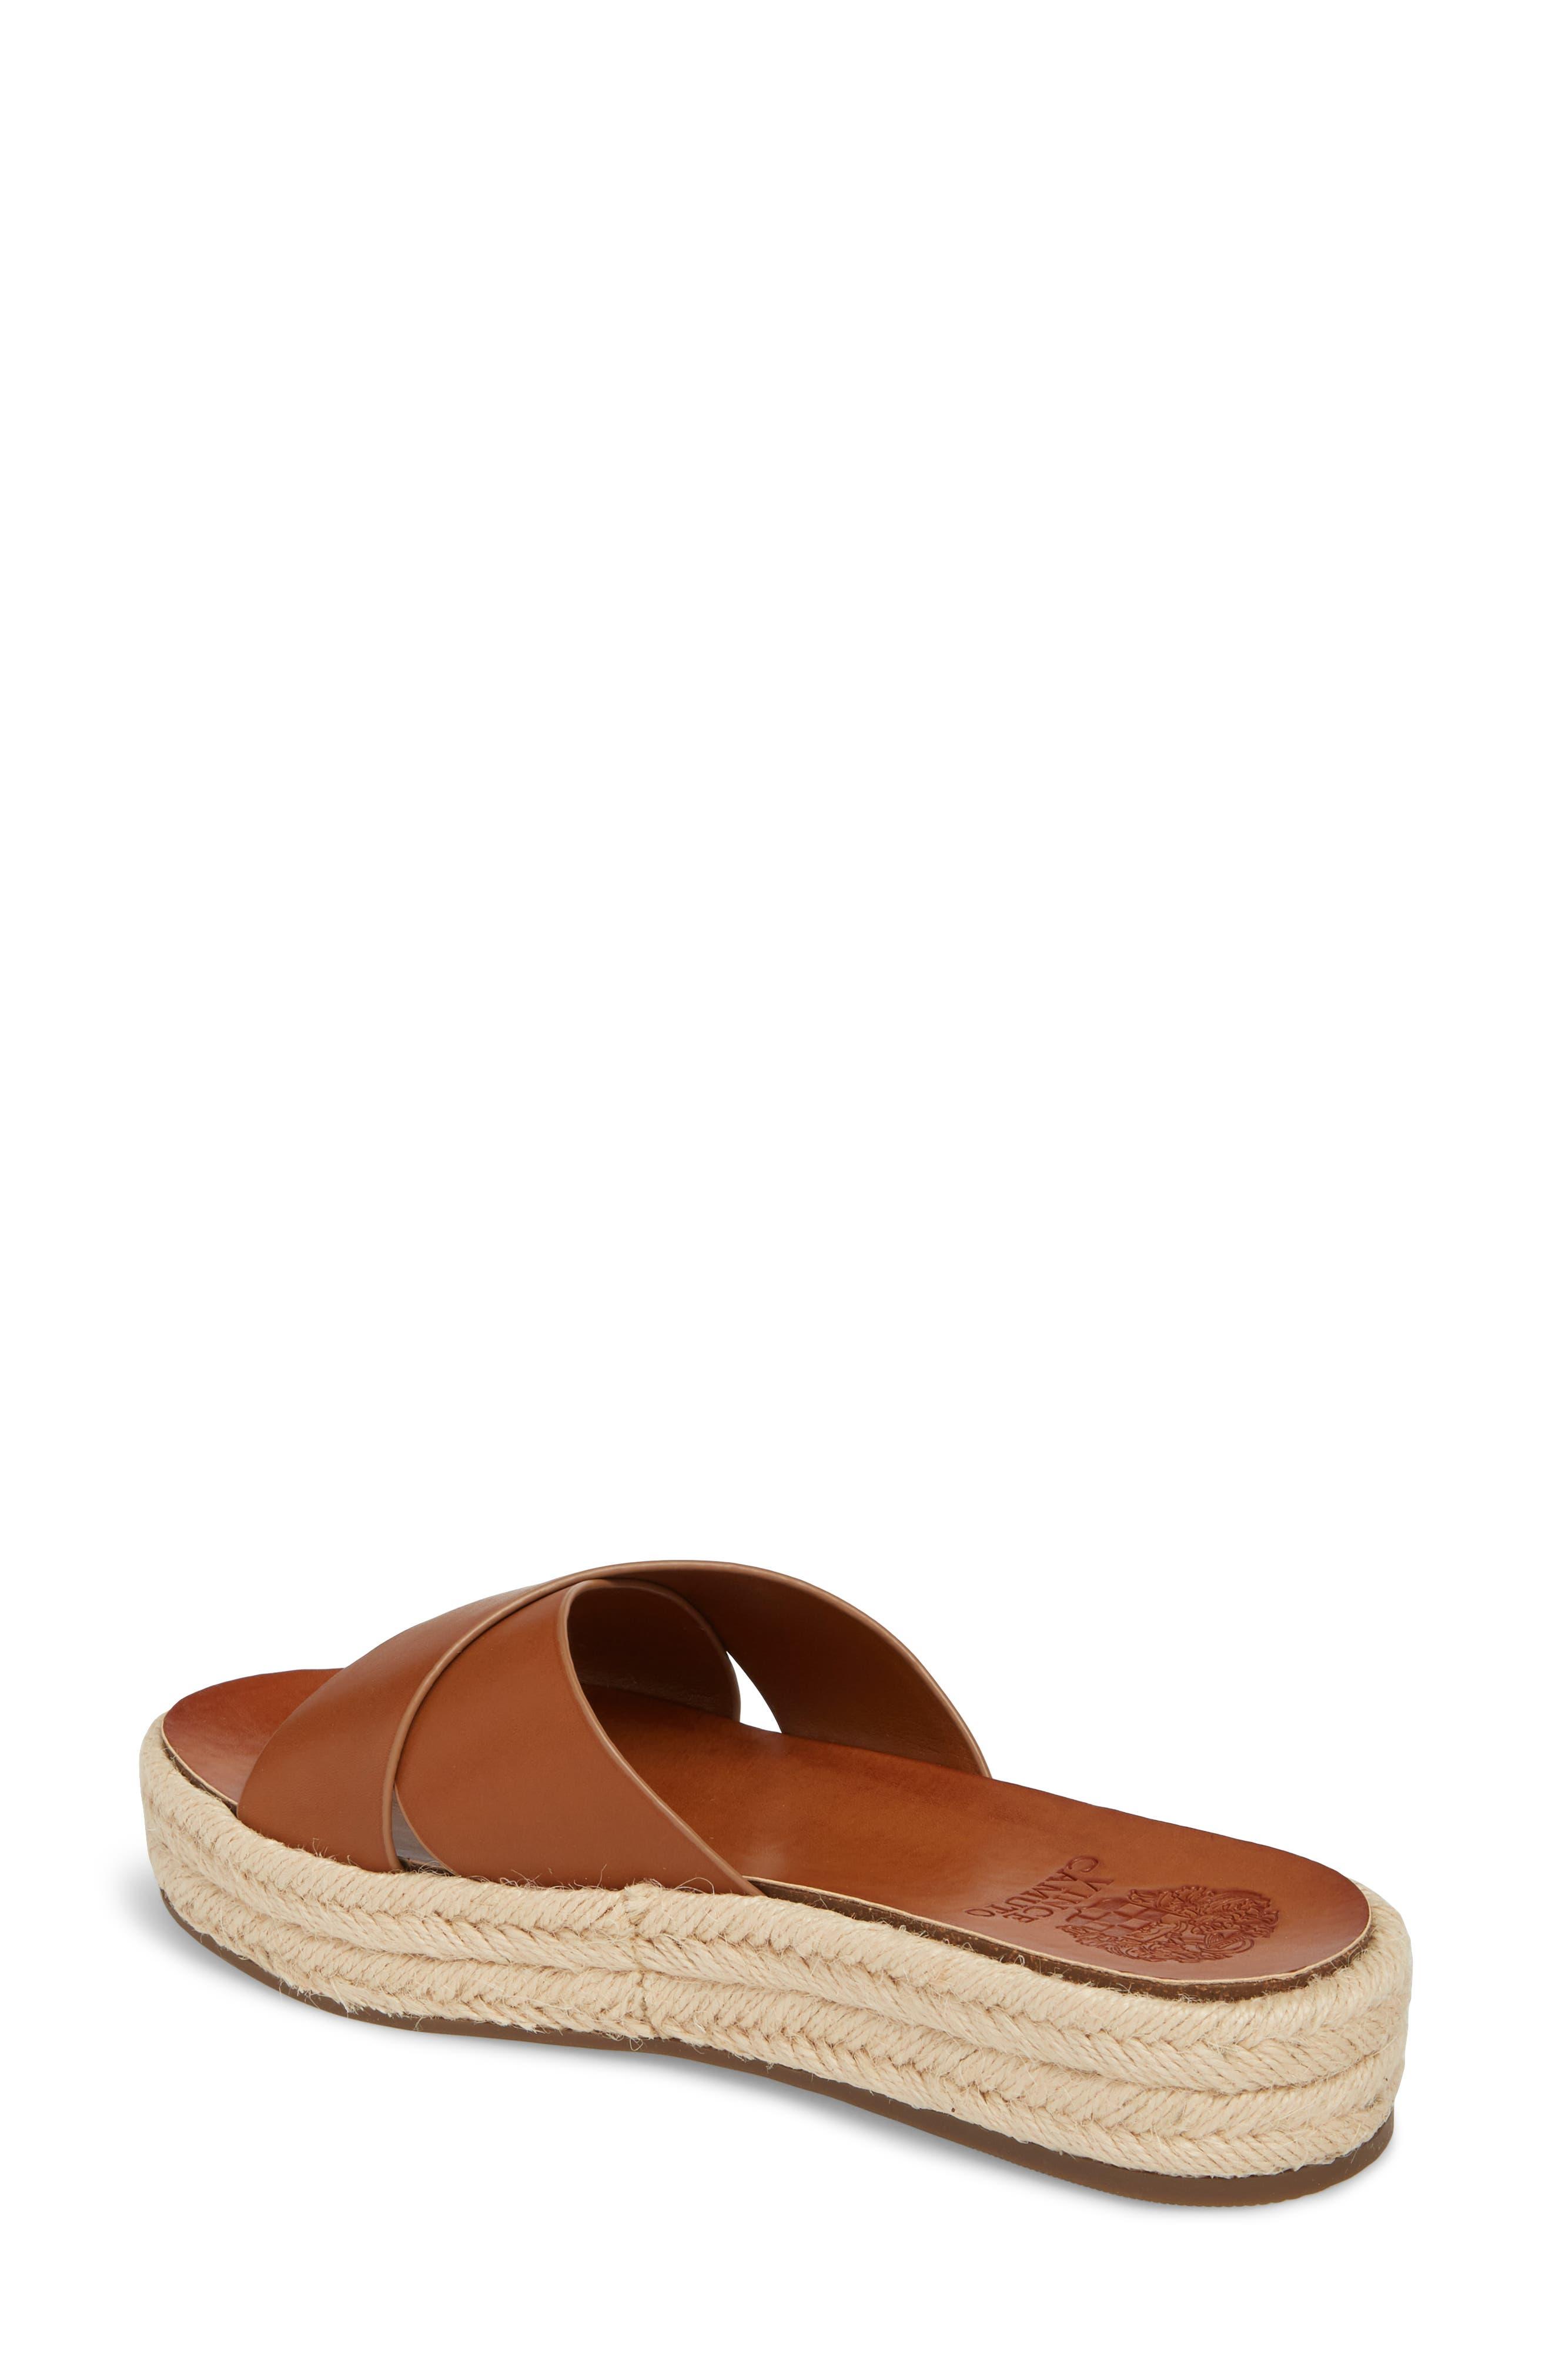 Carran Platform Sandal,                             Alternate thumbnail 9, color,